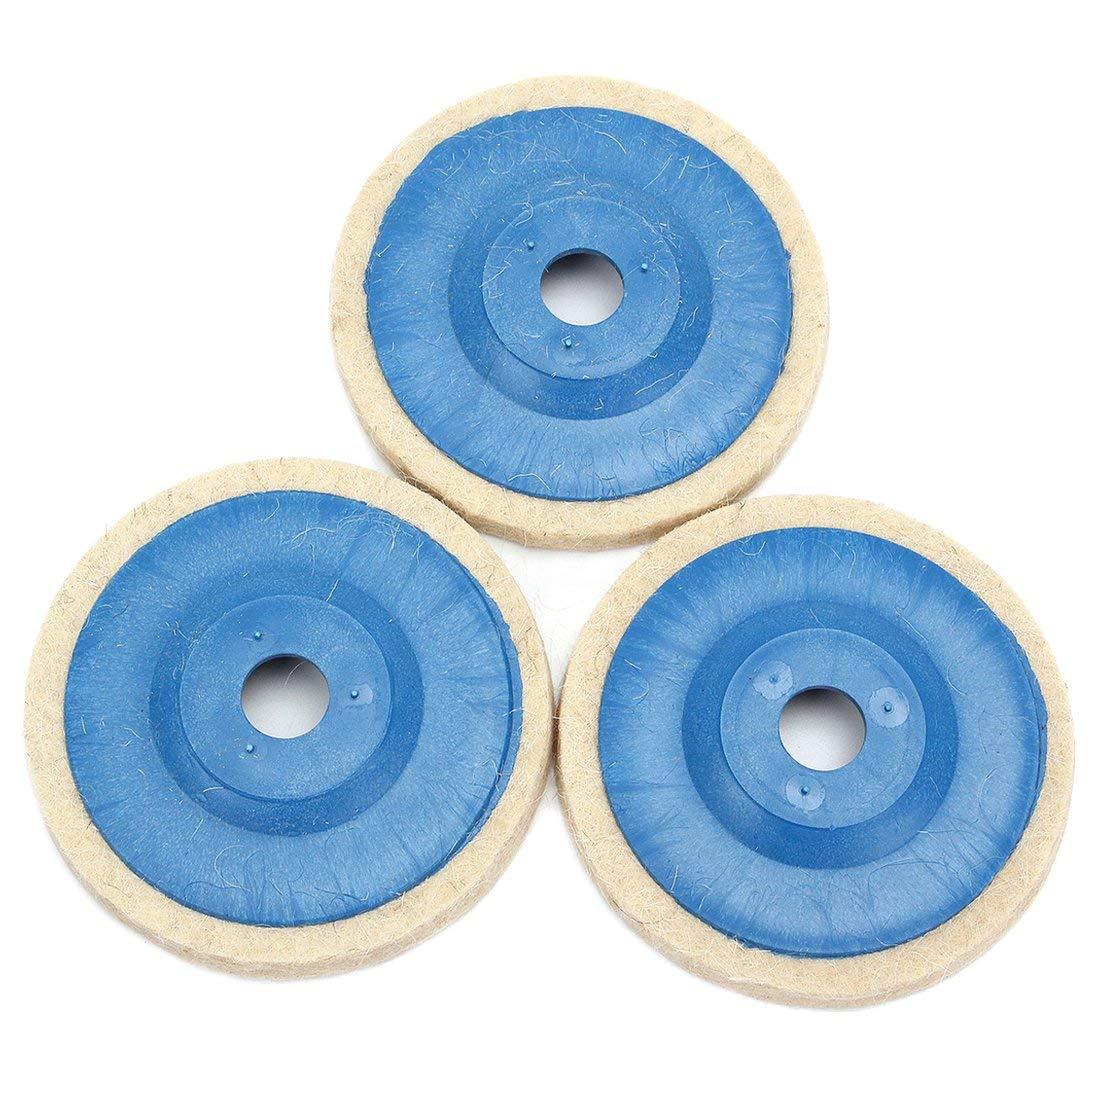 SODIAL(R) 3pcs 100mm 4Inch Grinding Pad wool Polishing Disc Abrasive Wheel Felt Buffer Set